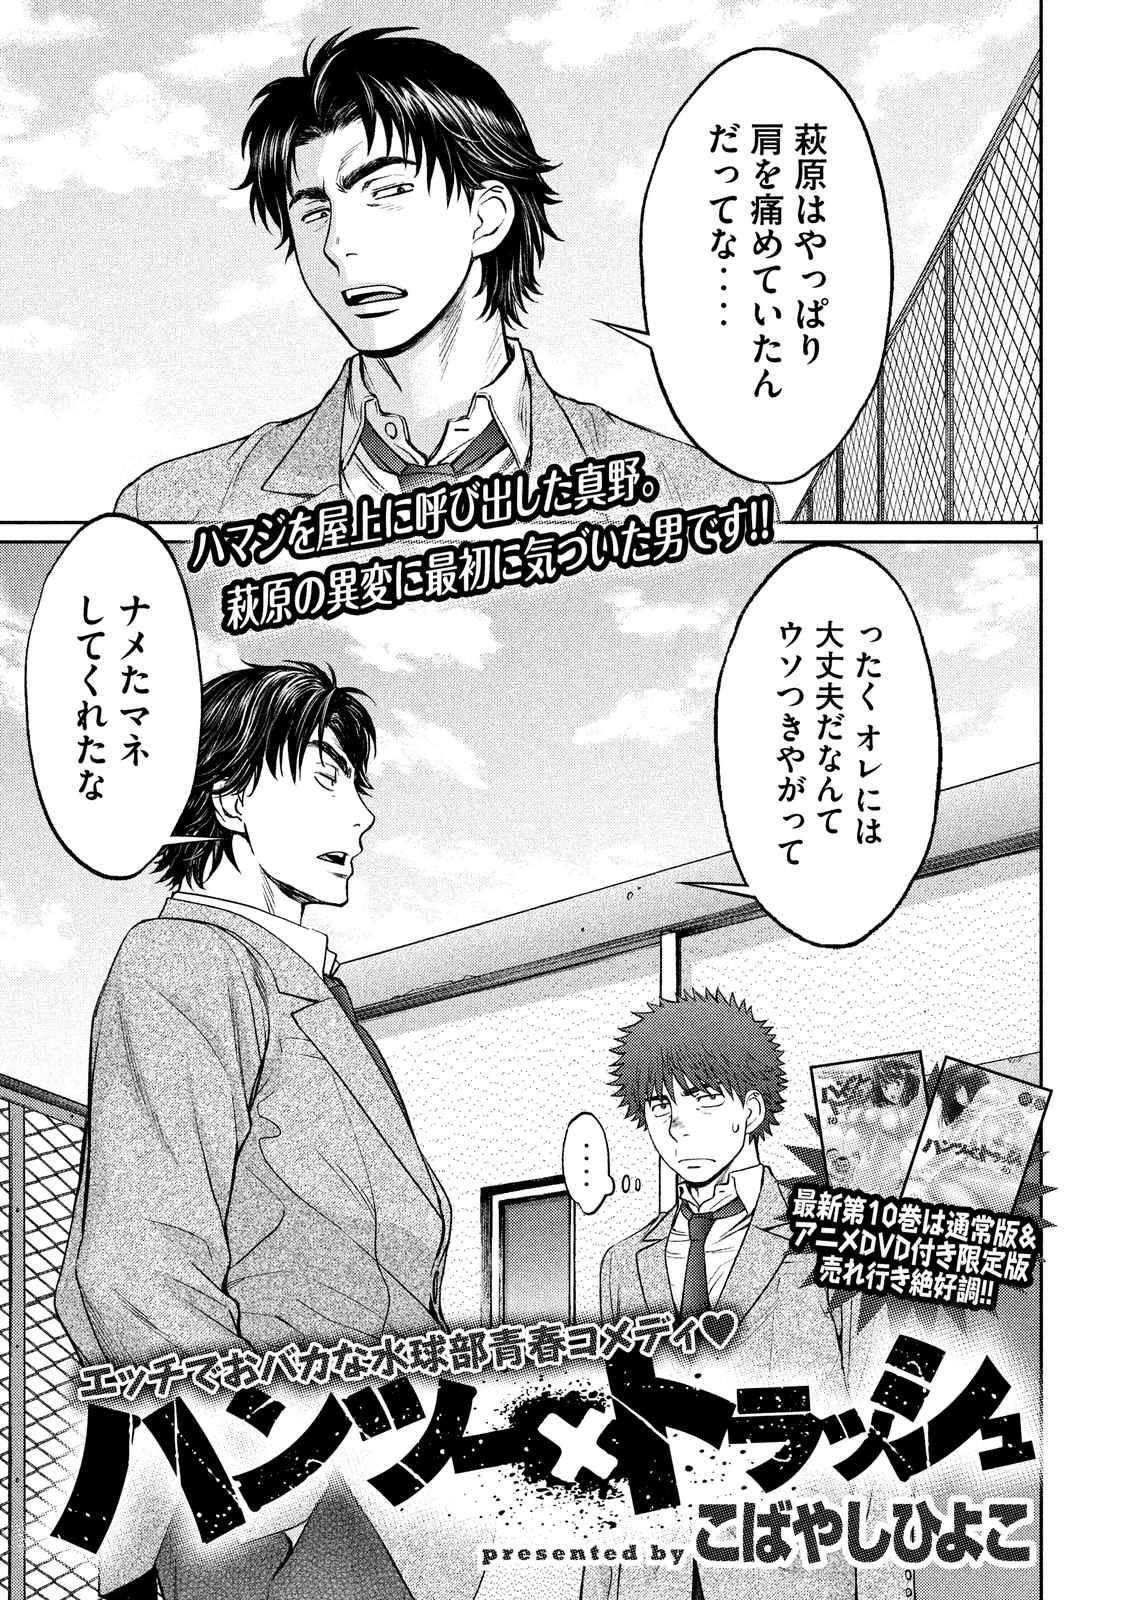 Hantsu x Trash - Chapter 117 - Page 1